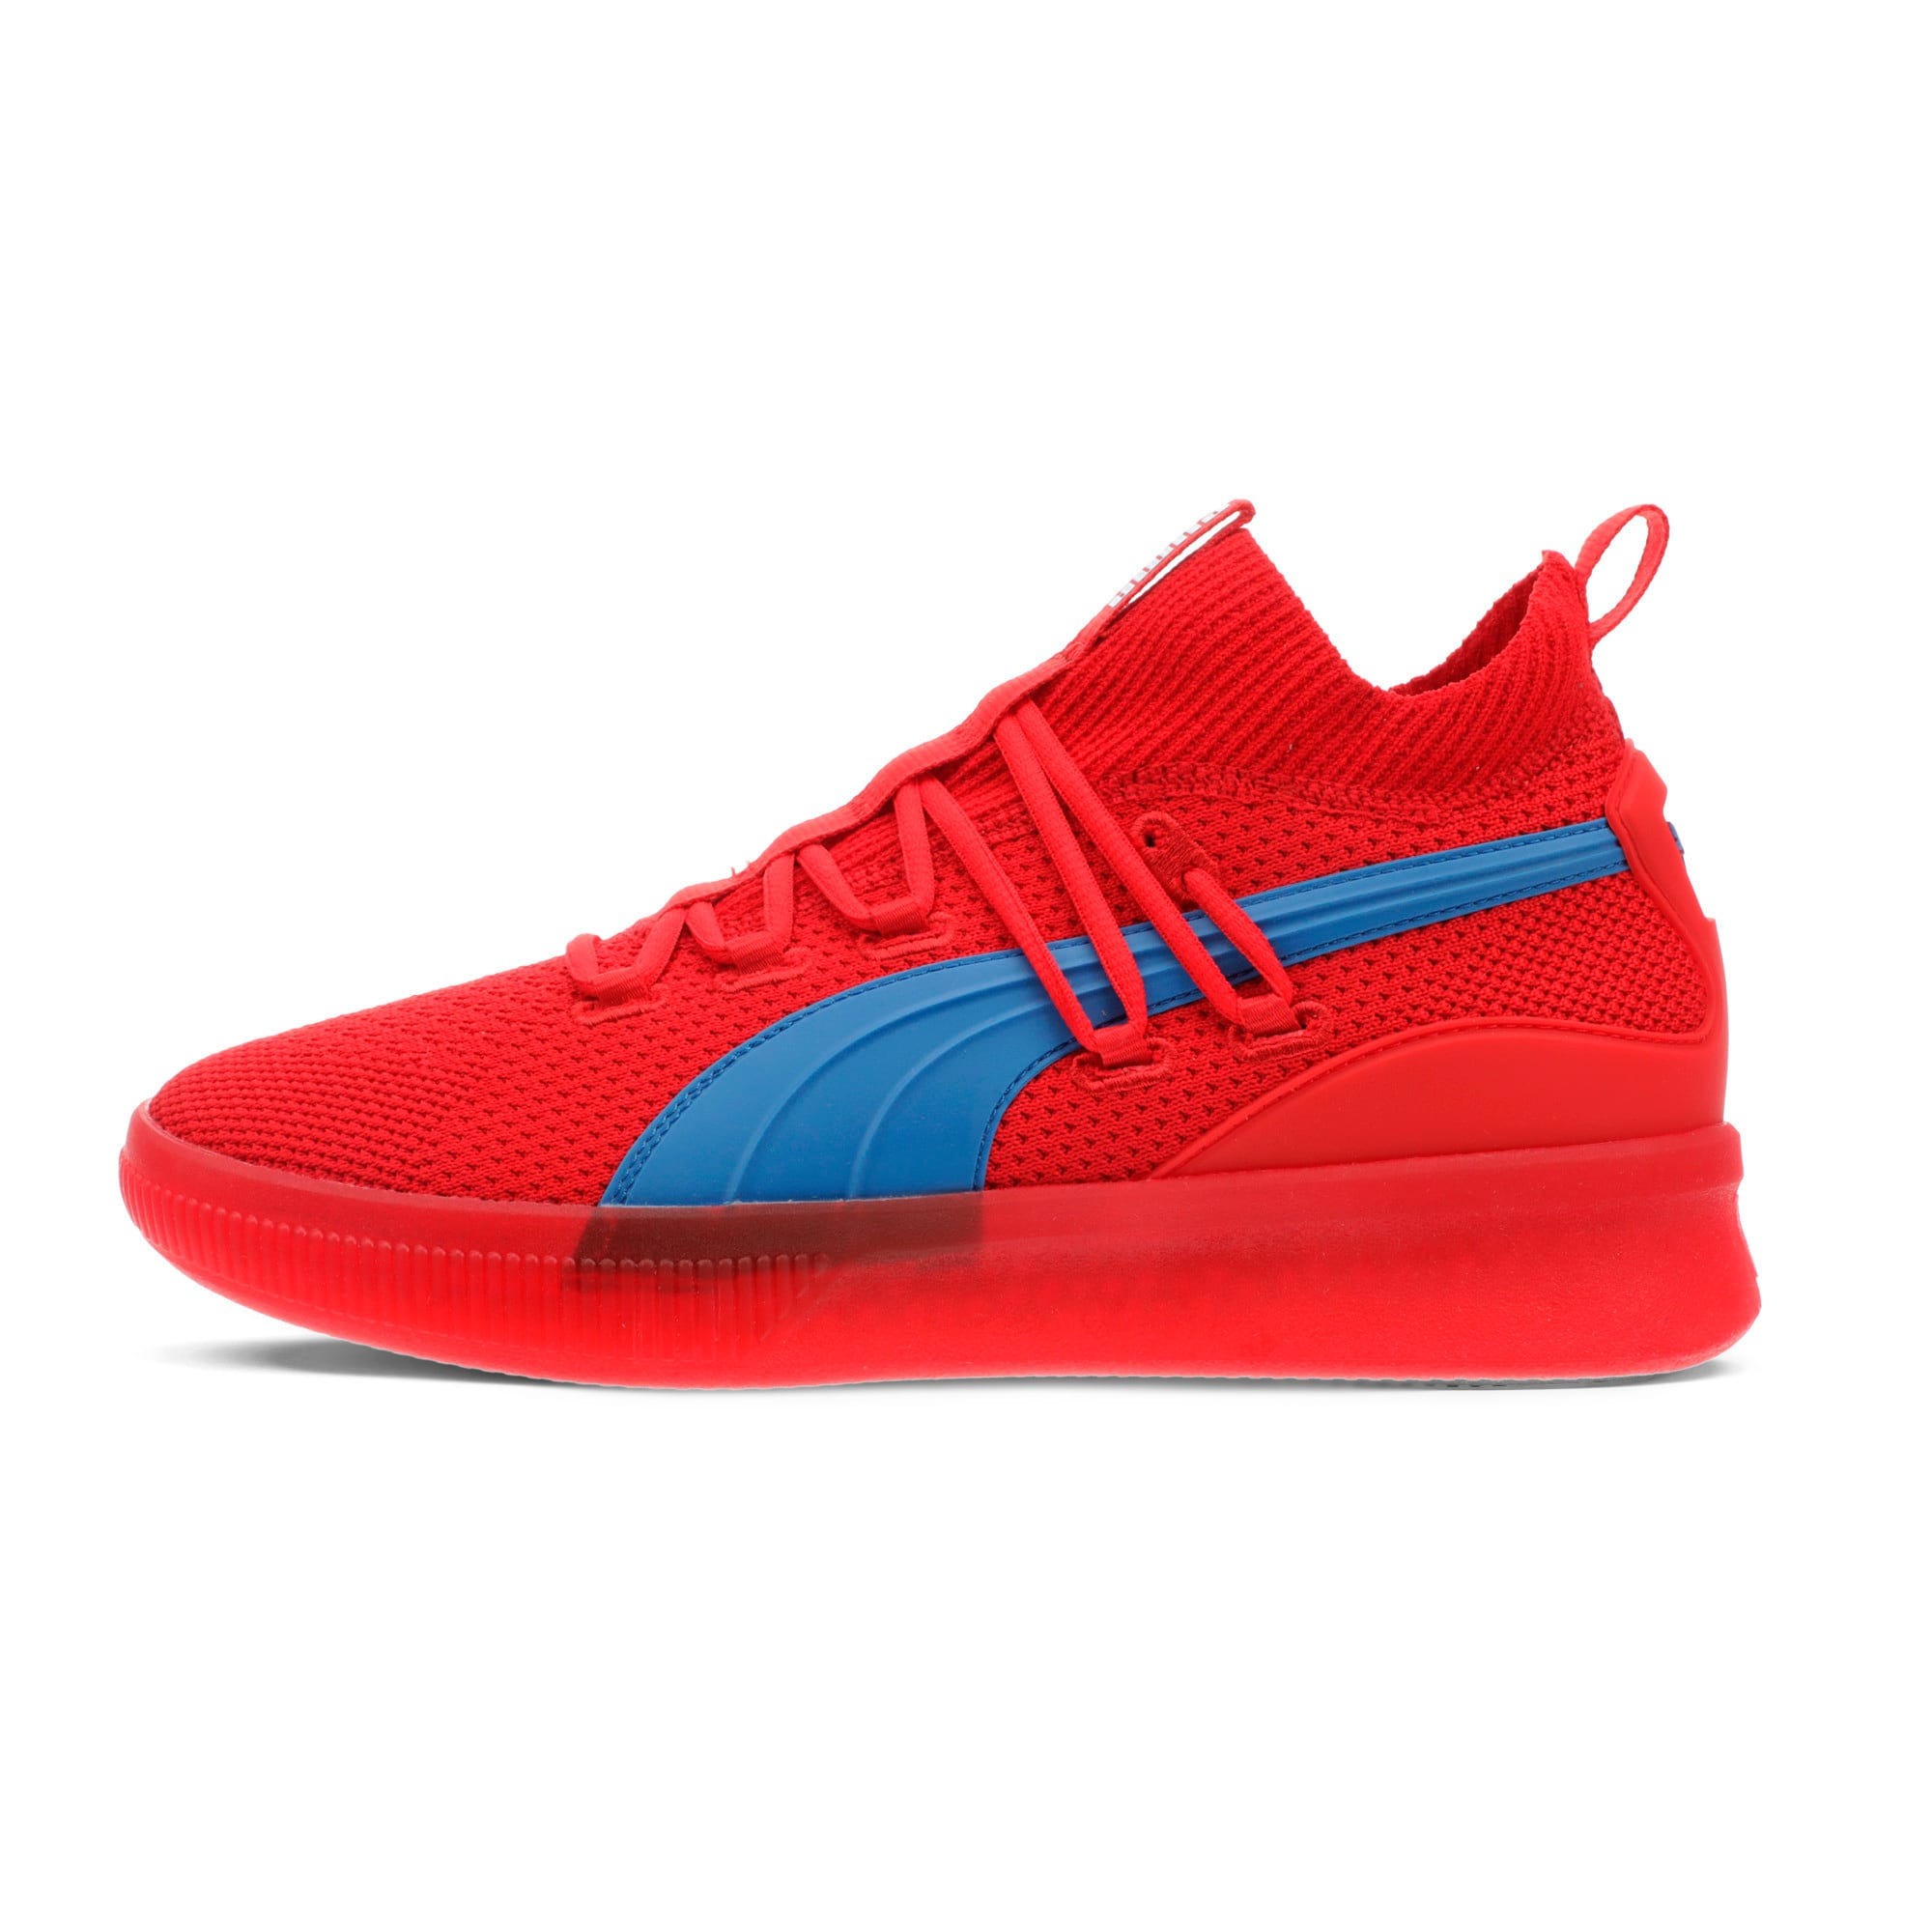 Miniatura 1 de ZapatosClyde Court Core Basketball, High Risk Red-Strong Blue, mediano